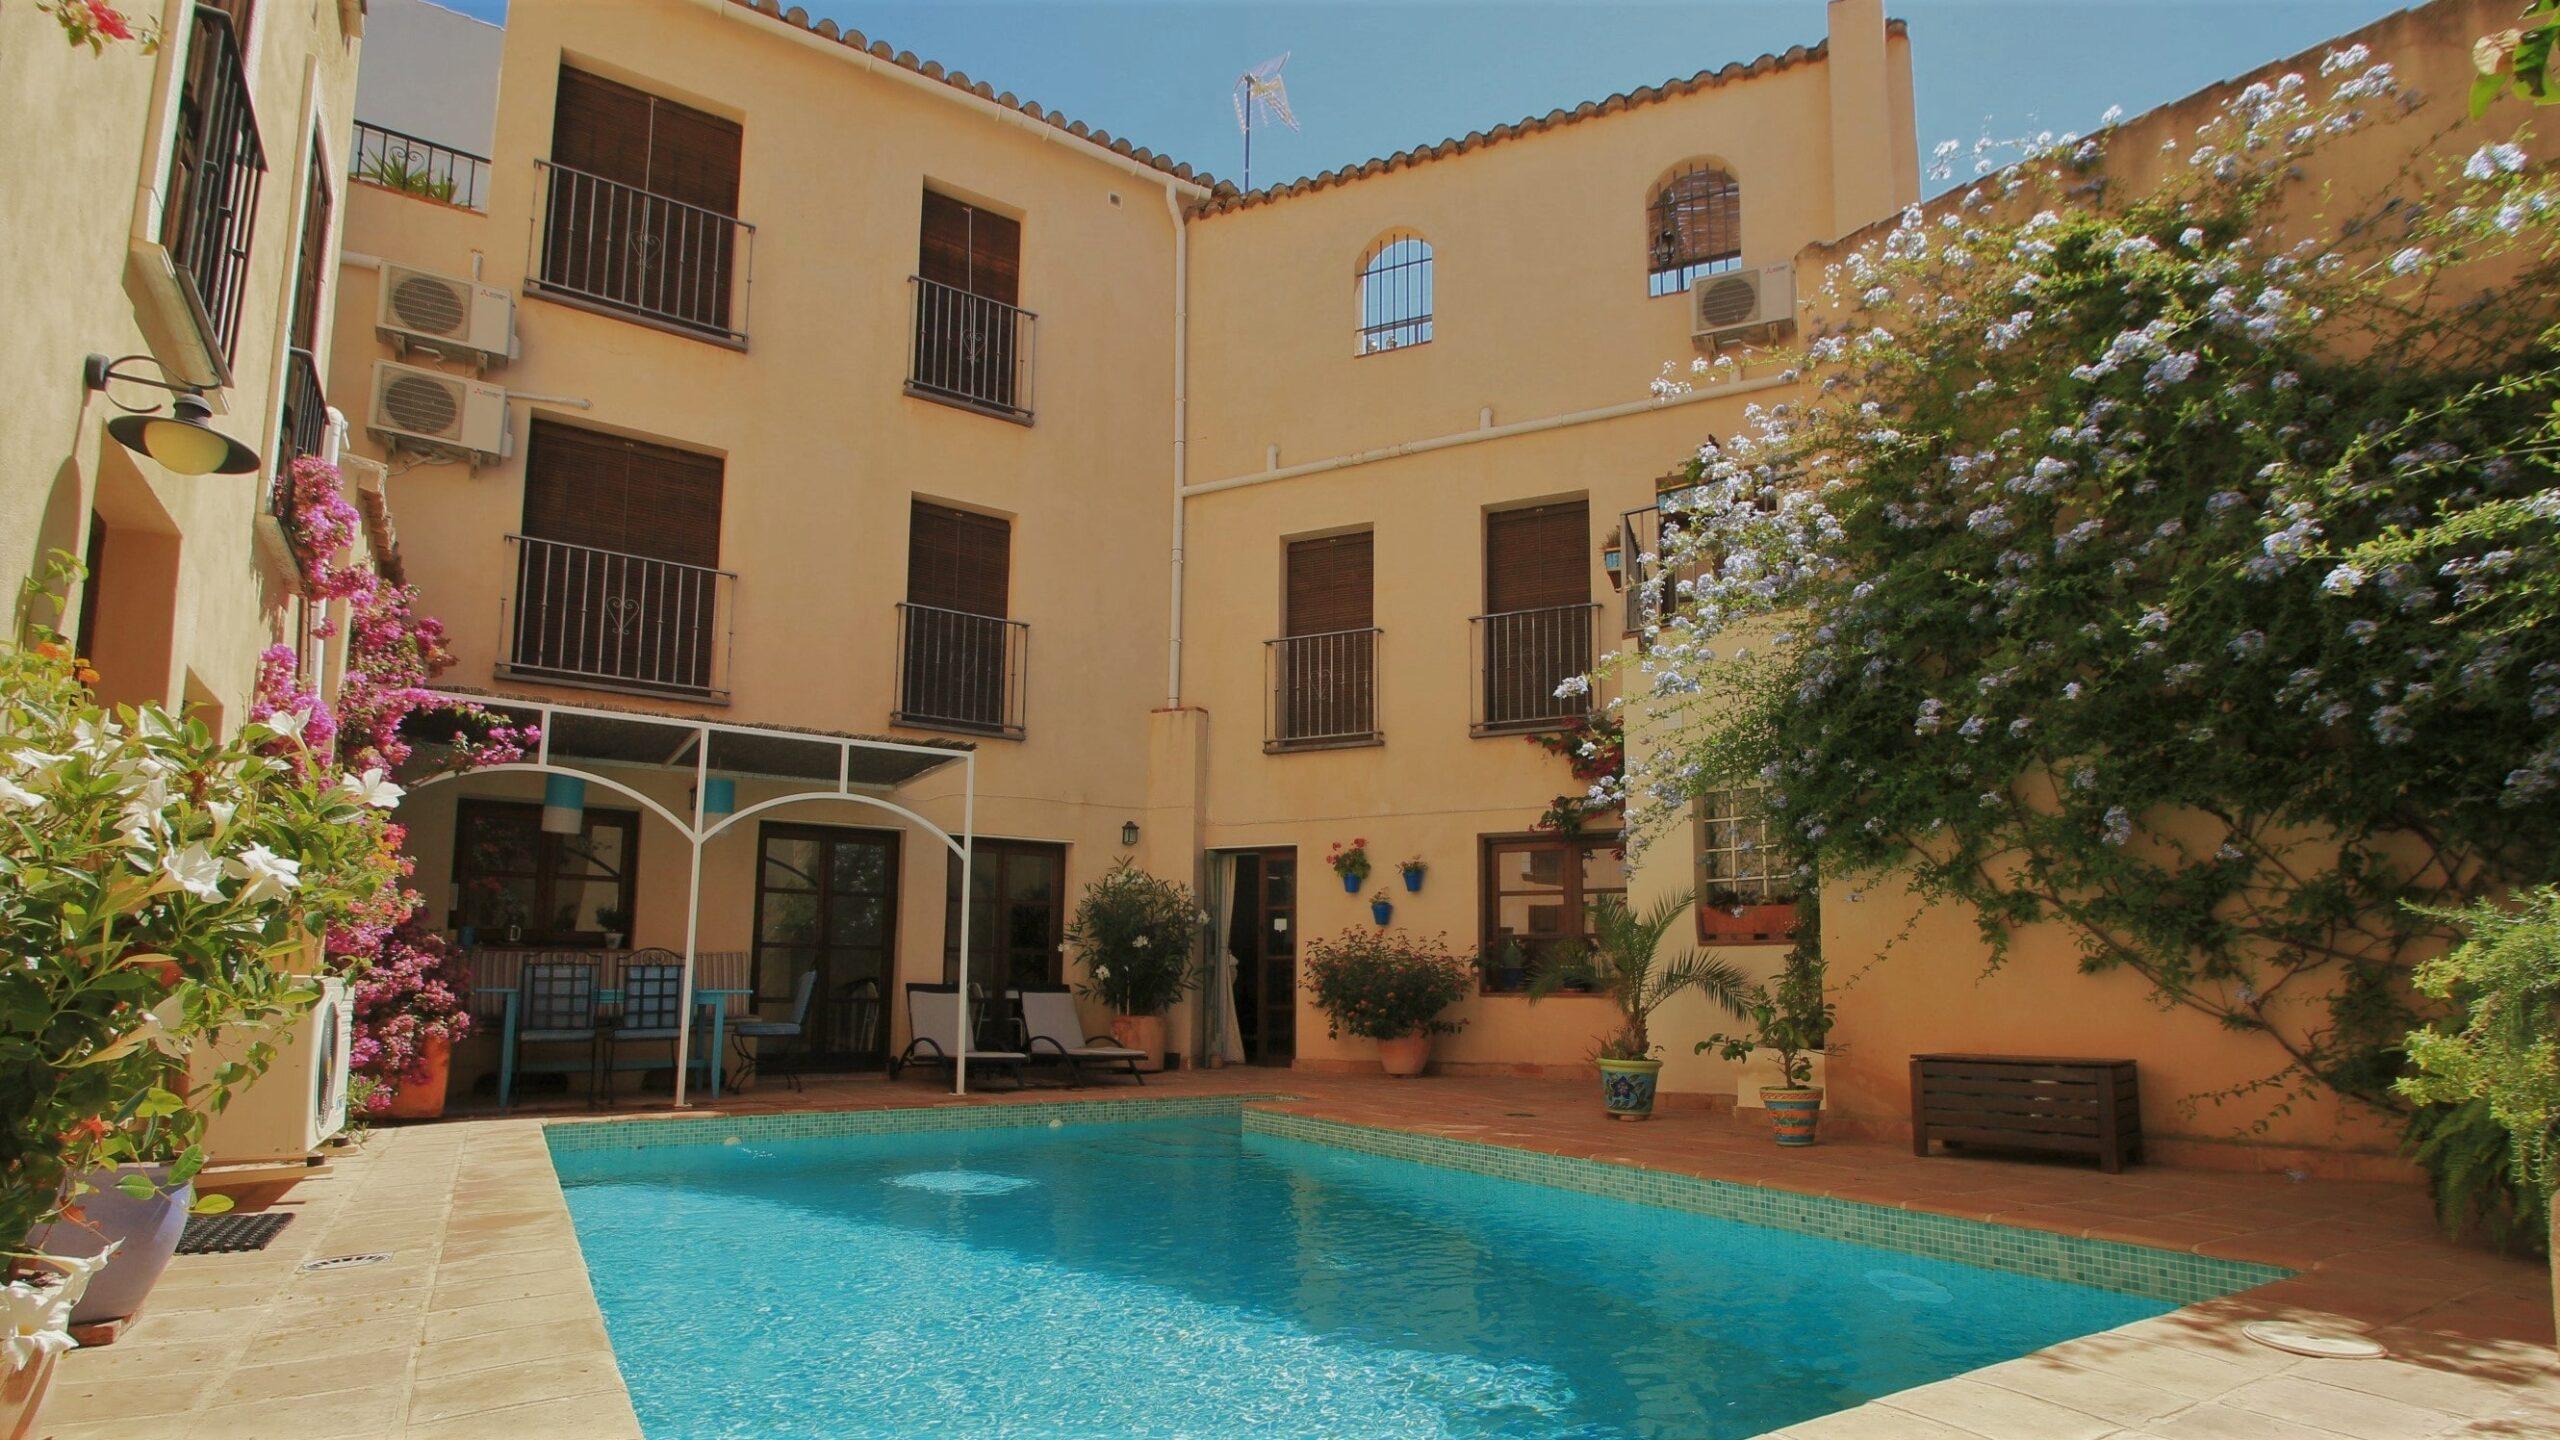 Wandelen in Andalusië Spanje